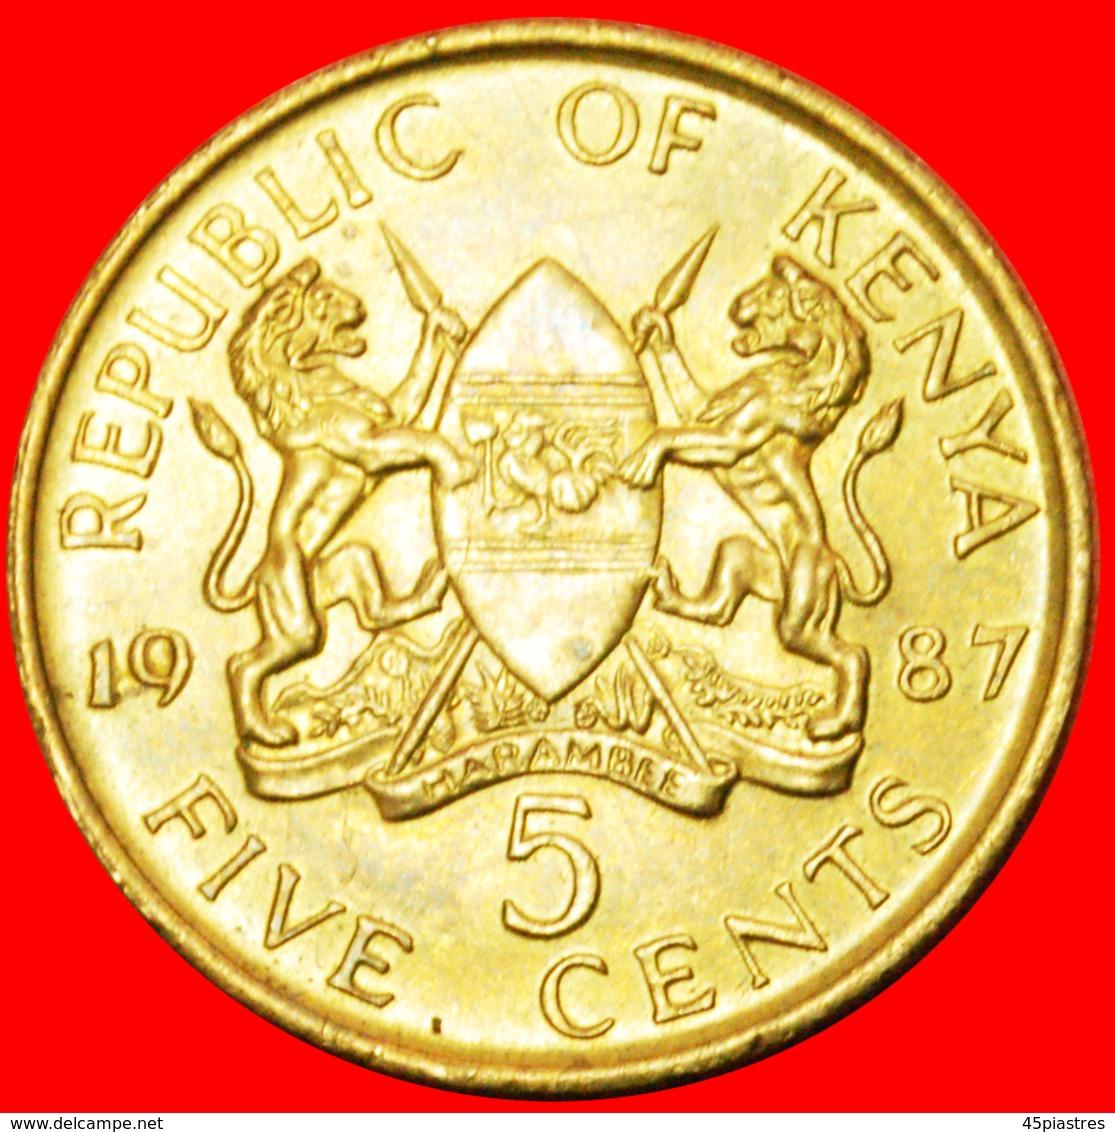 # COCK AND LIONS (1978-1991): KENYA ★ 5 CENTS 1987 MINT LUSTER! LOW START ★ NO RESERVE! - Kenya